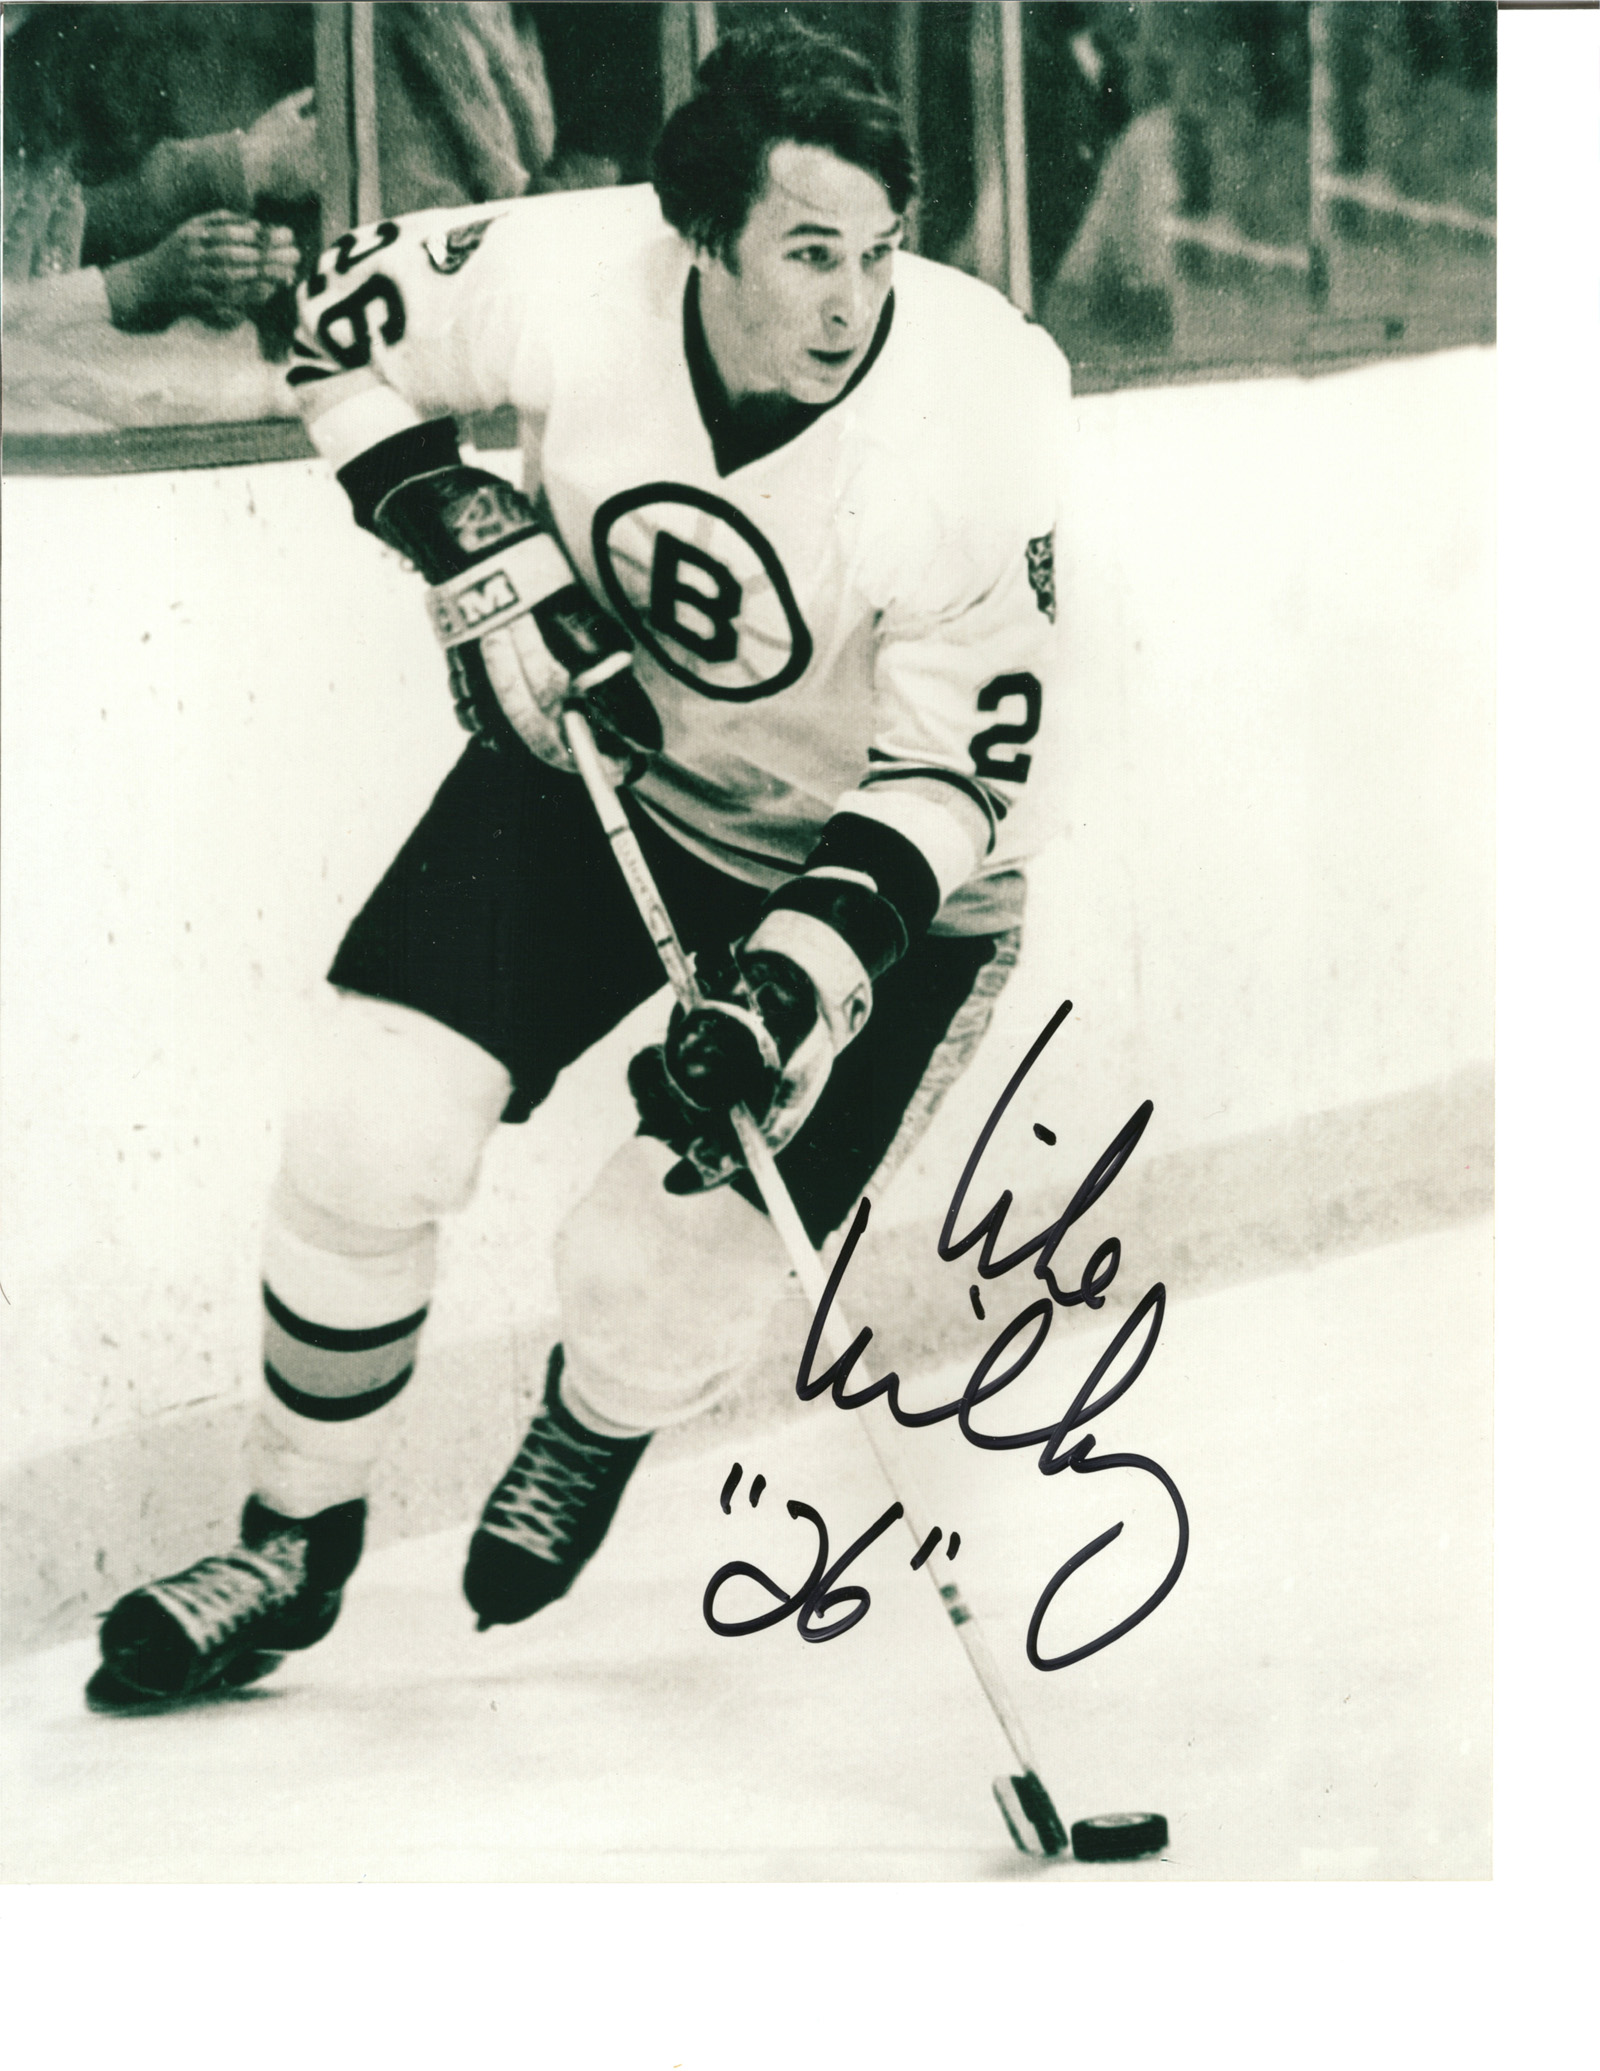 Mike Milbury autographed 8x10